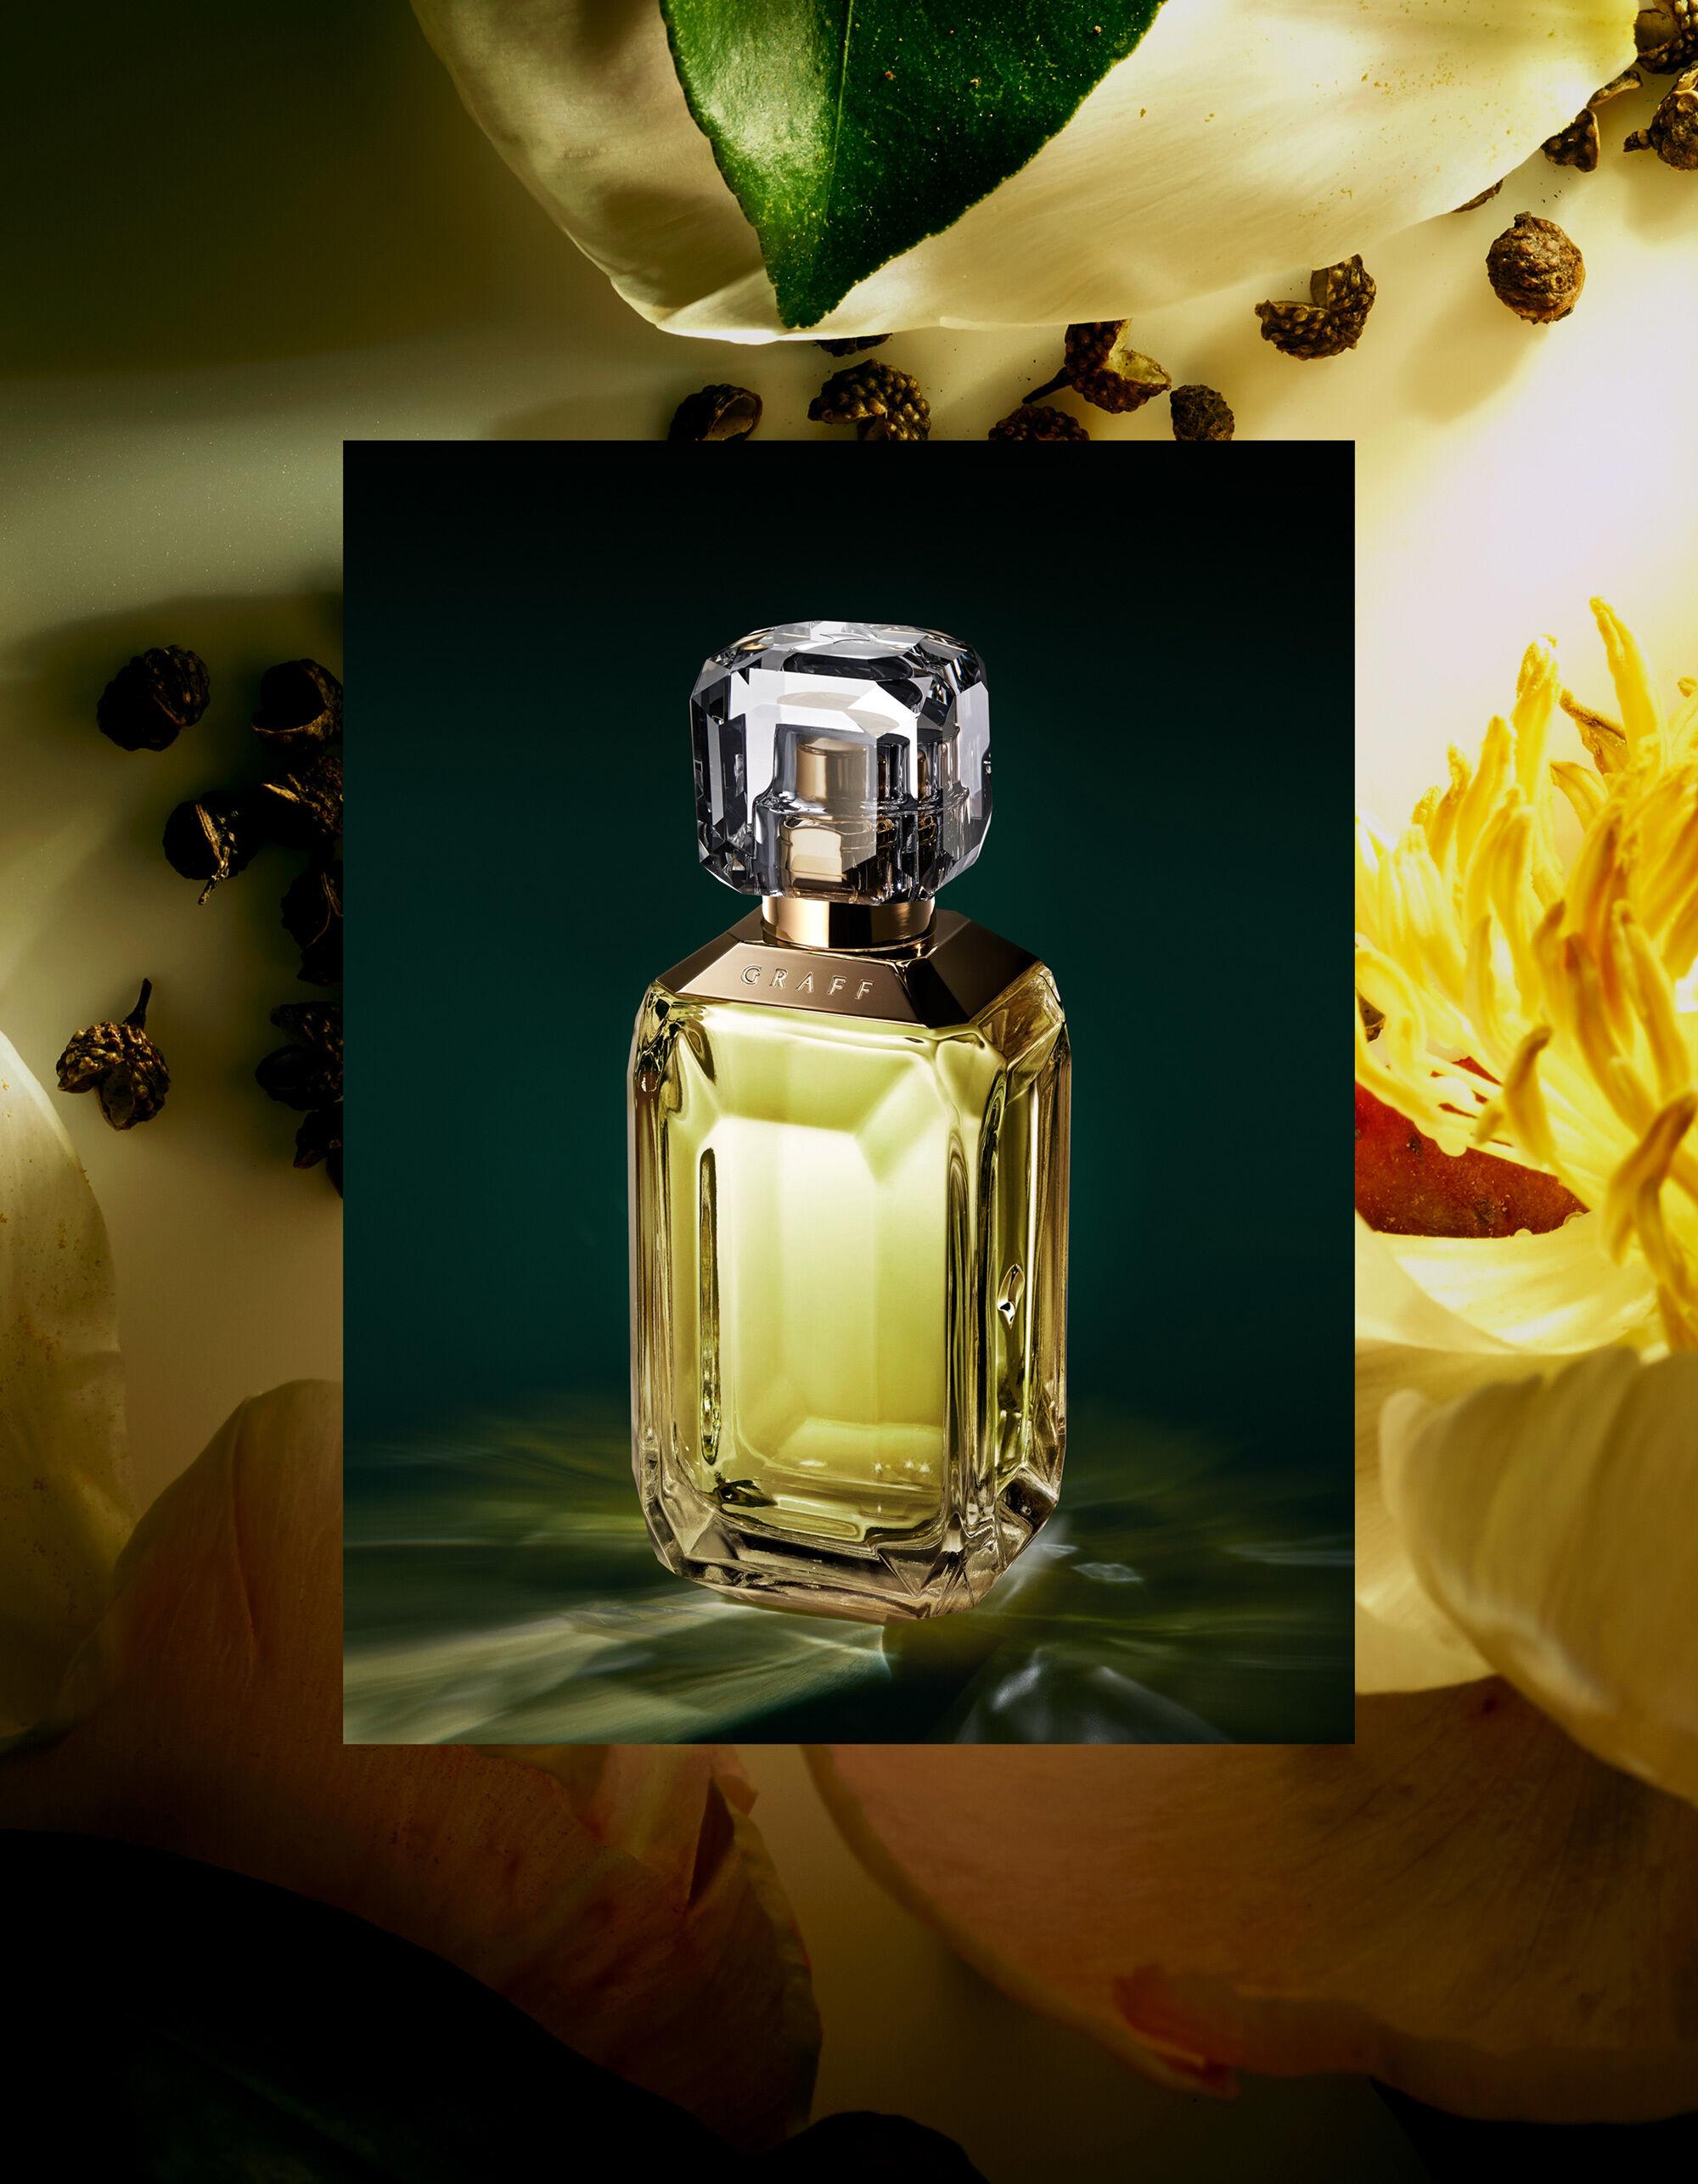 Lesedi La Rona II fragrance with ingredients by Graff